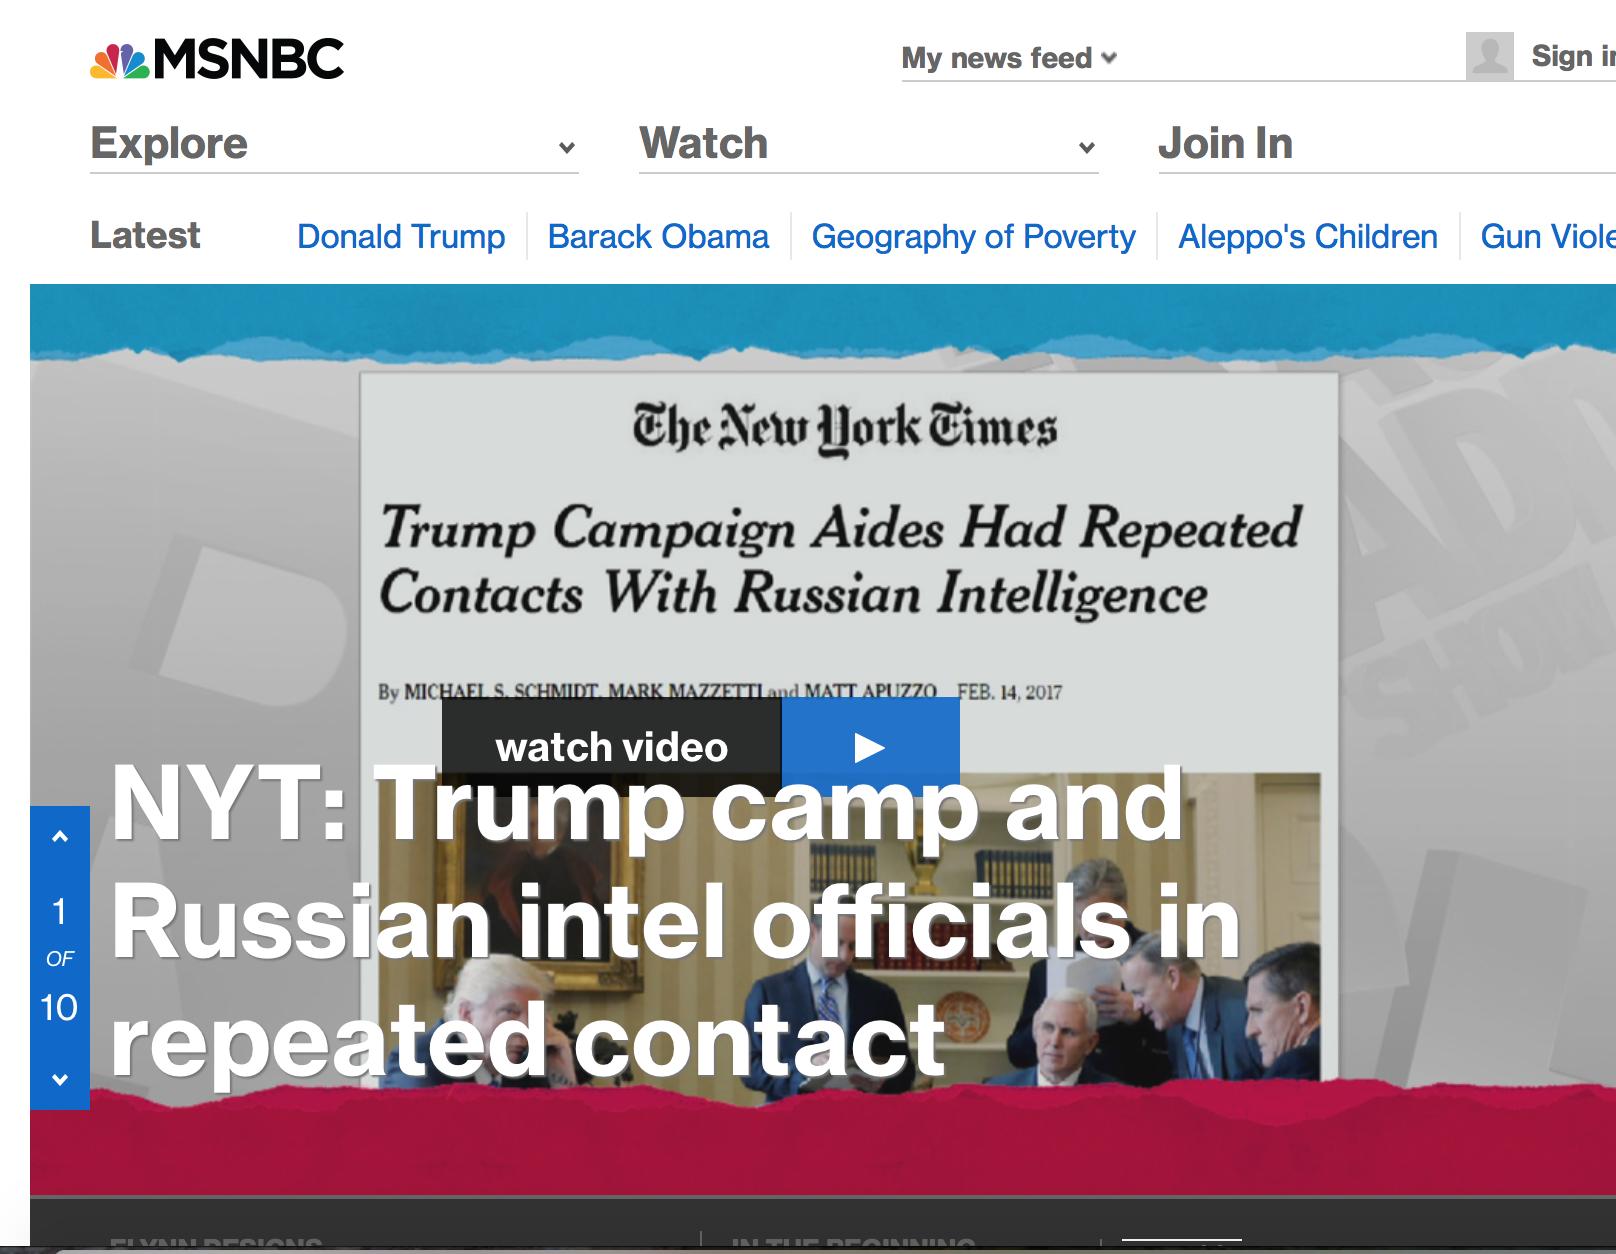 MSNBC_homepage_021417.png